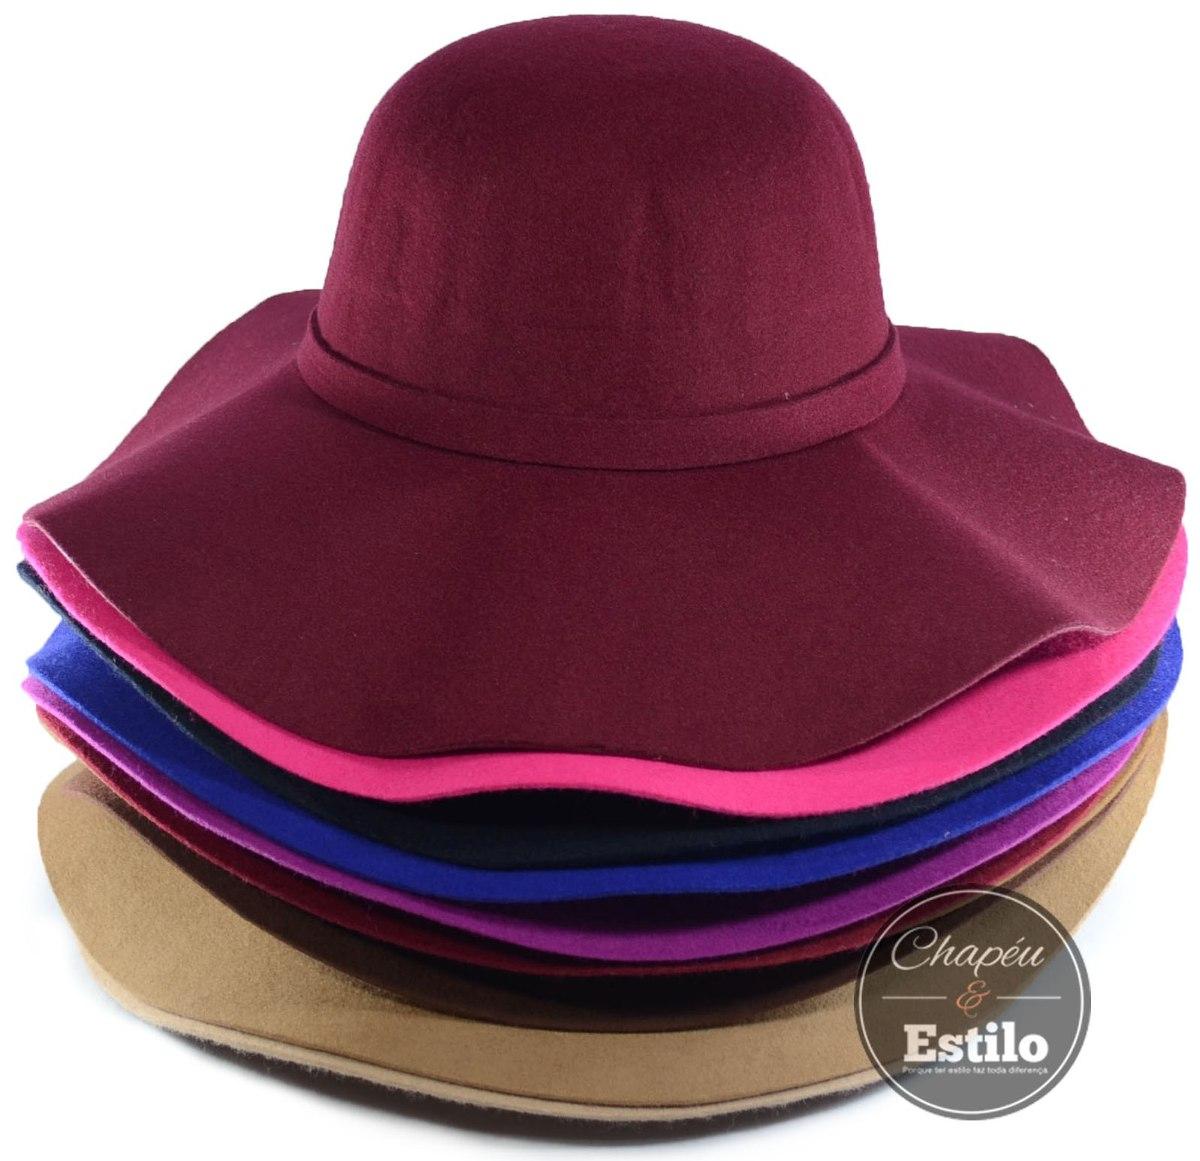 Chapéu Floppy Feminino Moda Tendência Retrô 100% Lã Pura - R  109 c514ecfcbf0